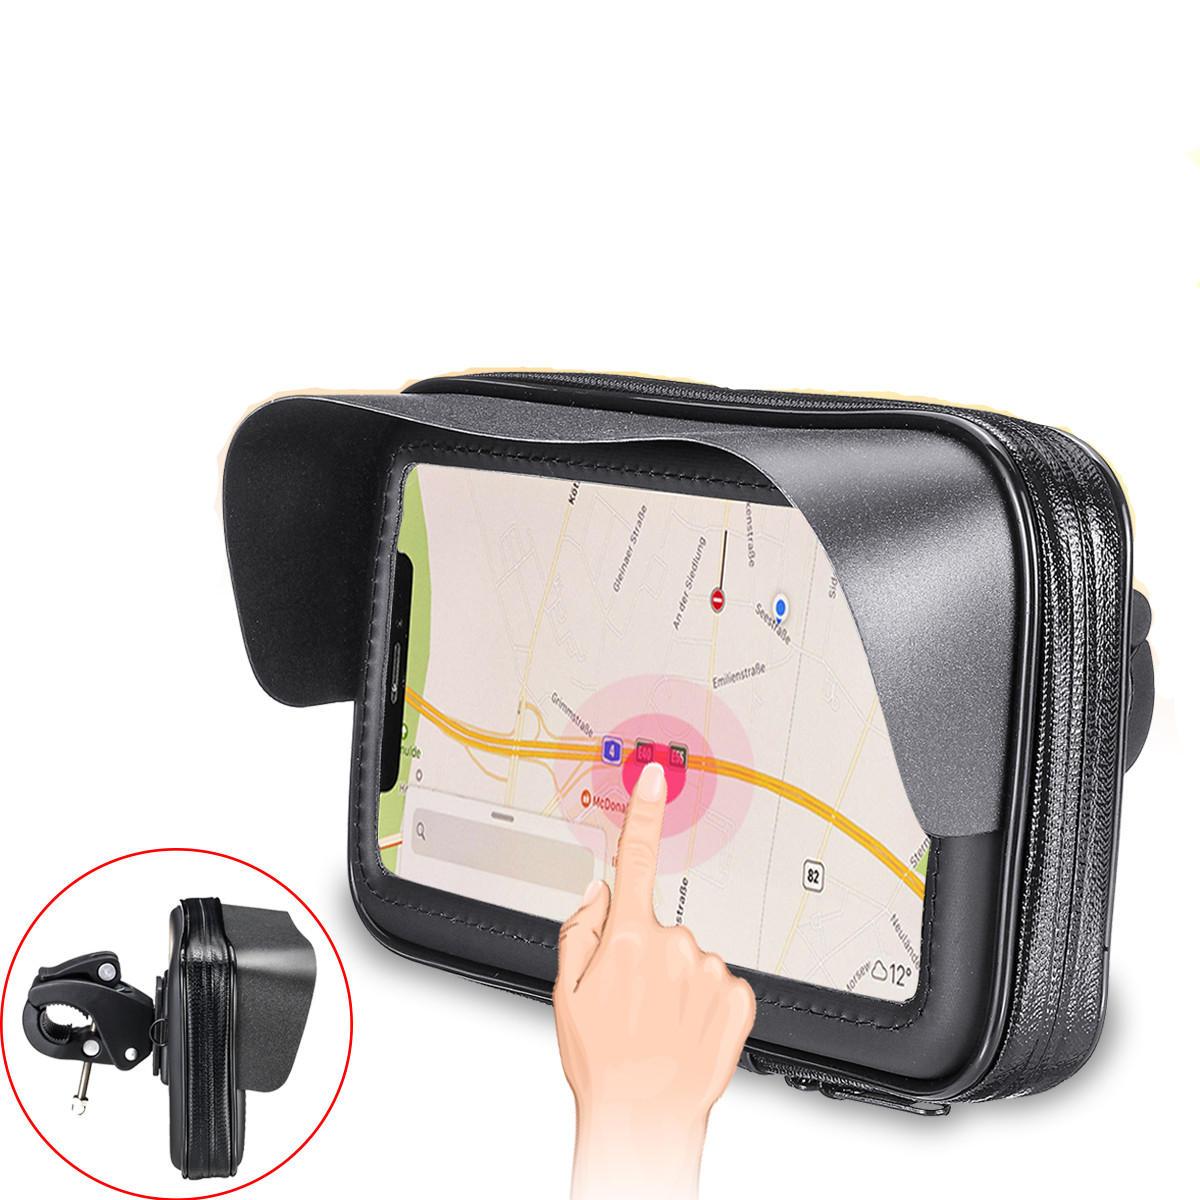 Sun Visor Waterproof Bike Bicycle Motorbike Handlebar Bag Touch Screen Phone Bag For Smart Phone Under 6.3 Inch